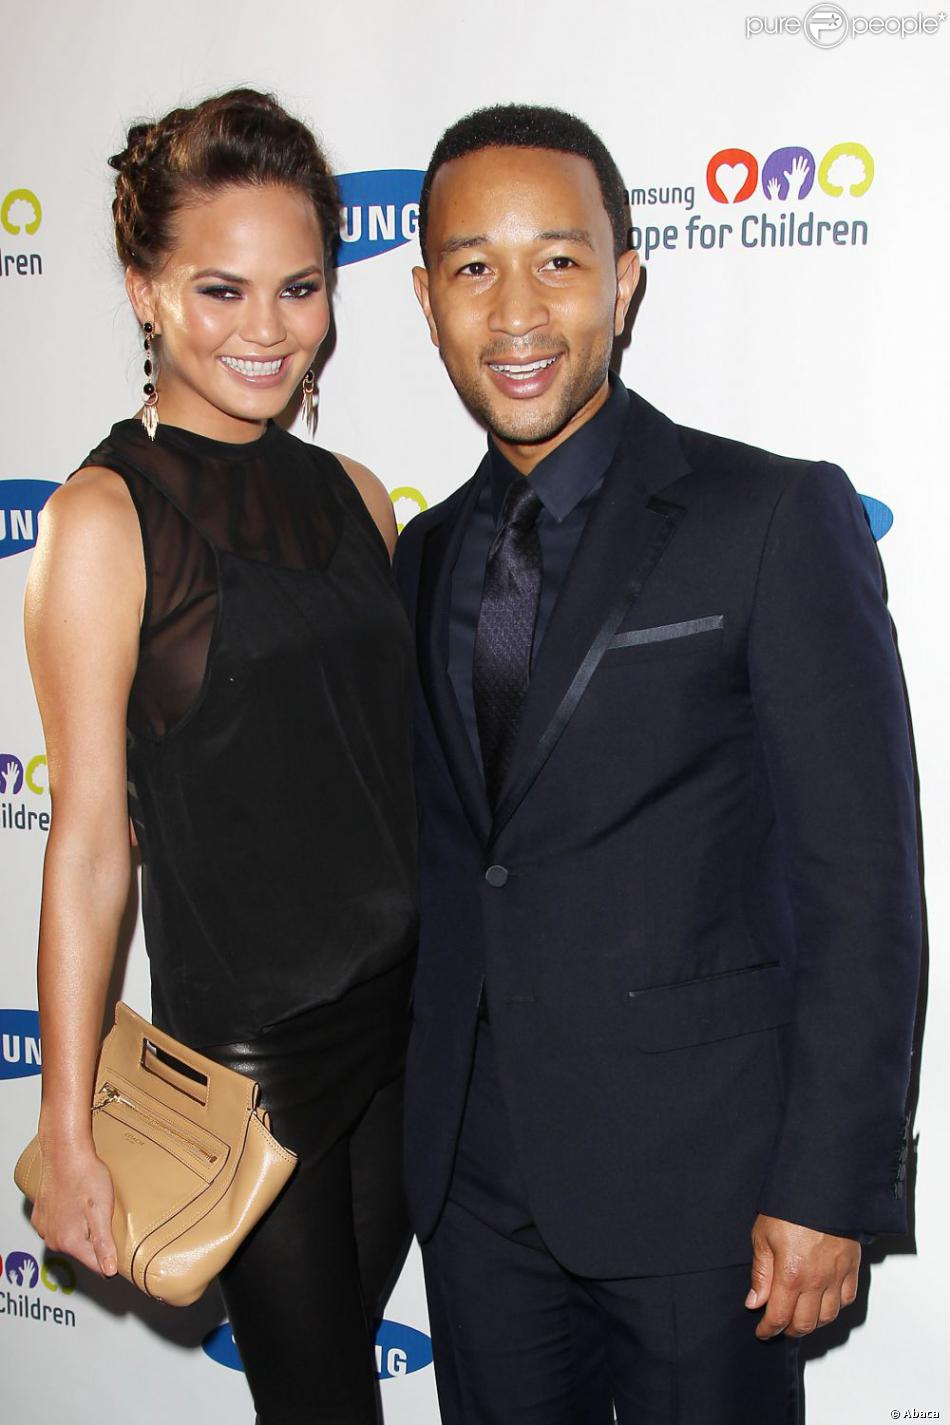 Chrissy Teigen et John Legend lors du Gala Samsung Hope for Children à New York le 11 juin 2013